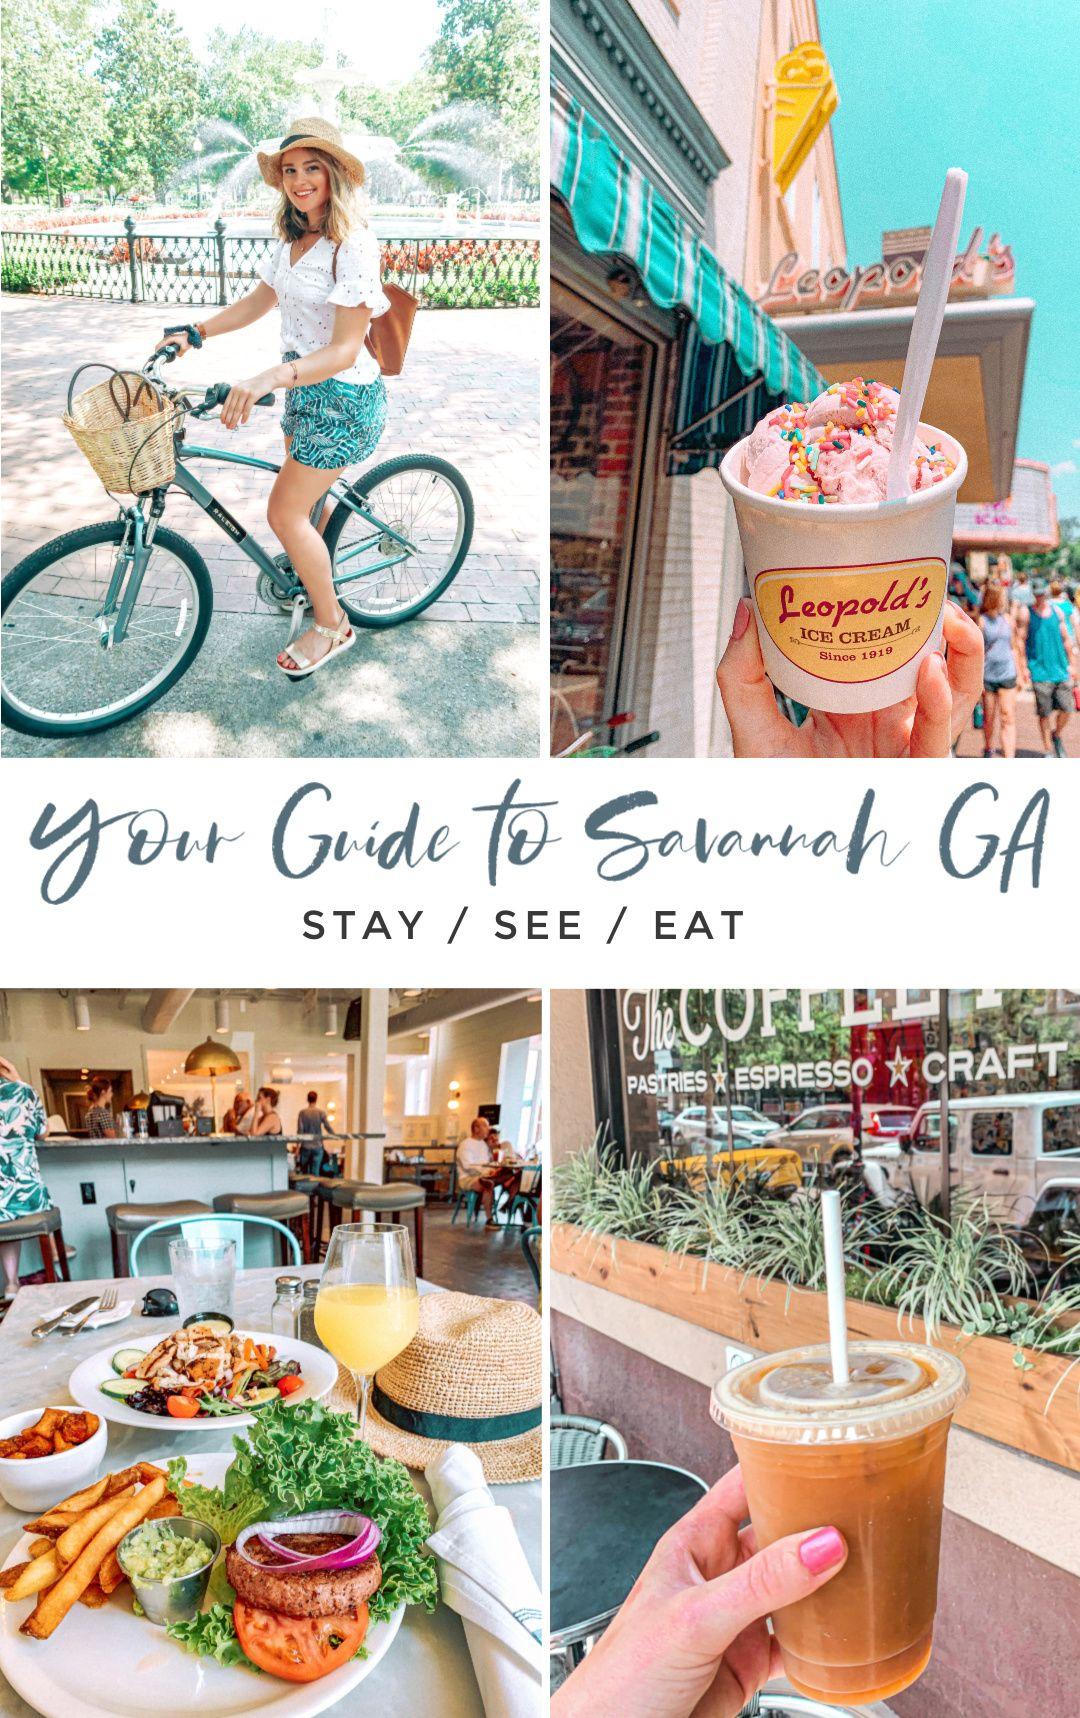 The Ultimate Weekend Travel Guide To Savannah Georgia Simply Taralynn Food Lifestyle Blog Savannah Chat Savannah Georgia Travel Georgia Travel